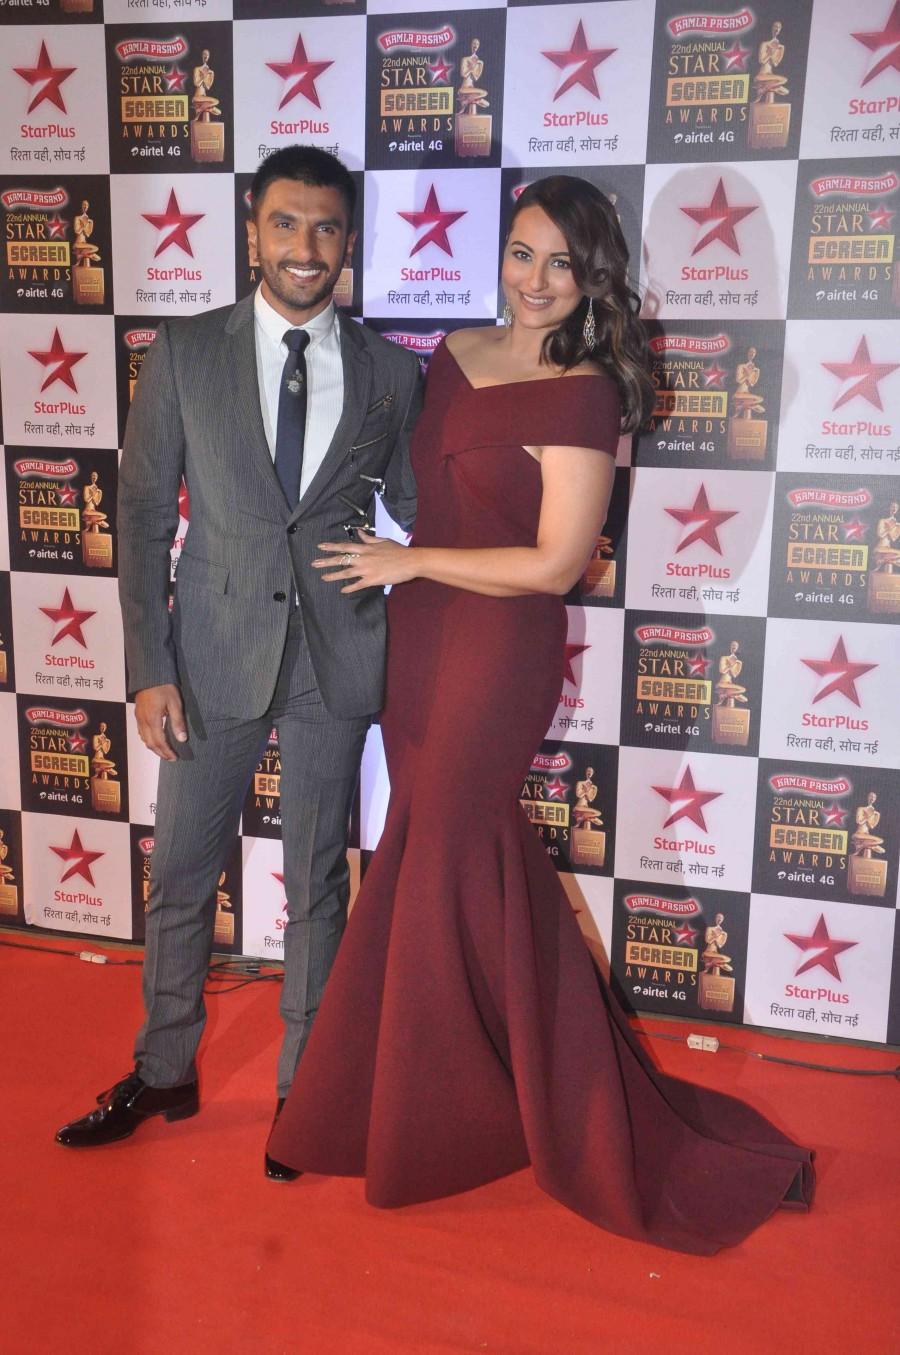 22nd Annual Star Screen Awards 2015,22nd Annual Star Screen Awards,Annual Star Screen Awards,Annual Star Screen